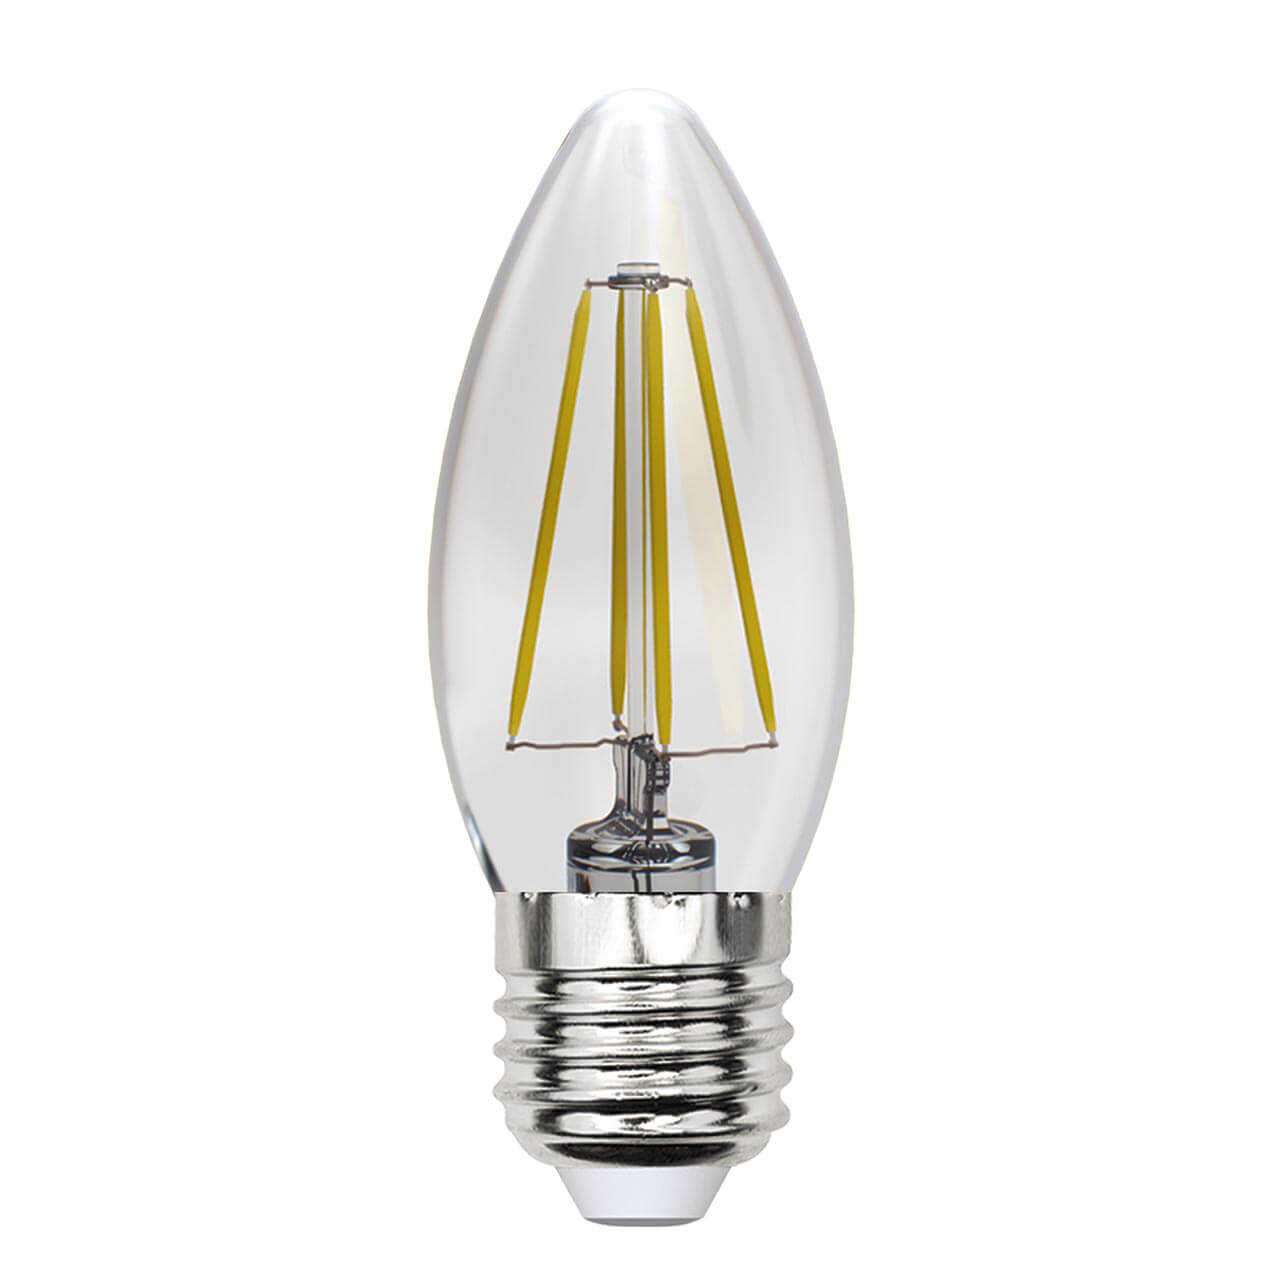 Фото - Лампочка Uniel LED-C35-13W/3000K/E27/CL PLS02WH Sky лампочка uniel led g45 13w 3000k e27 cl pls02wh sky